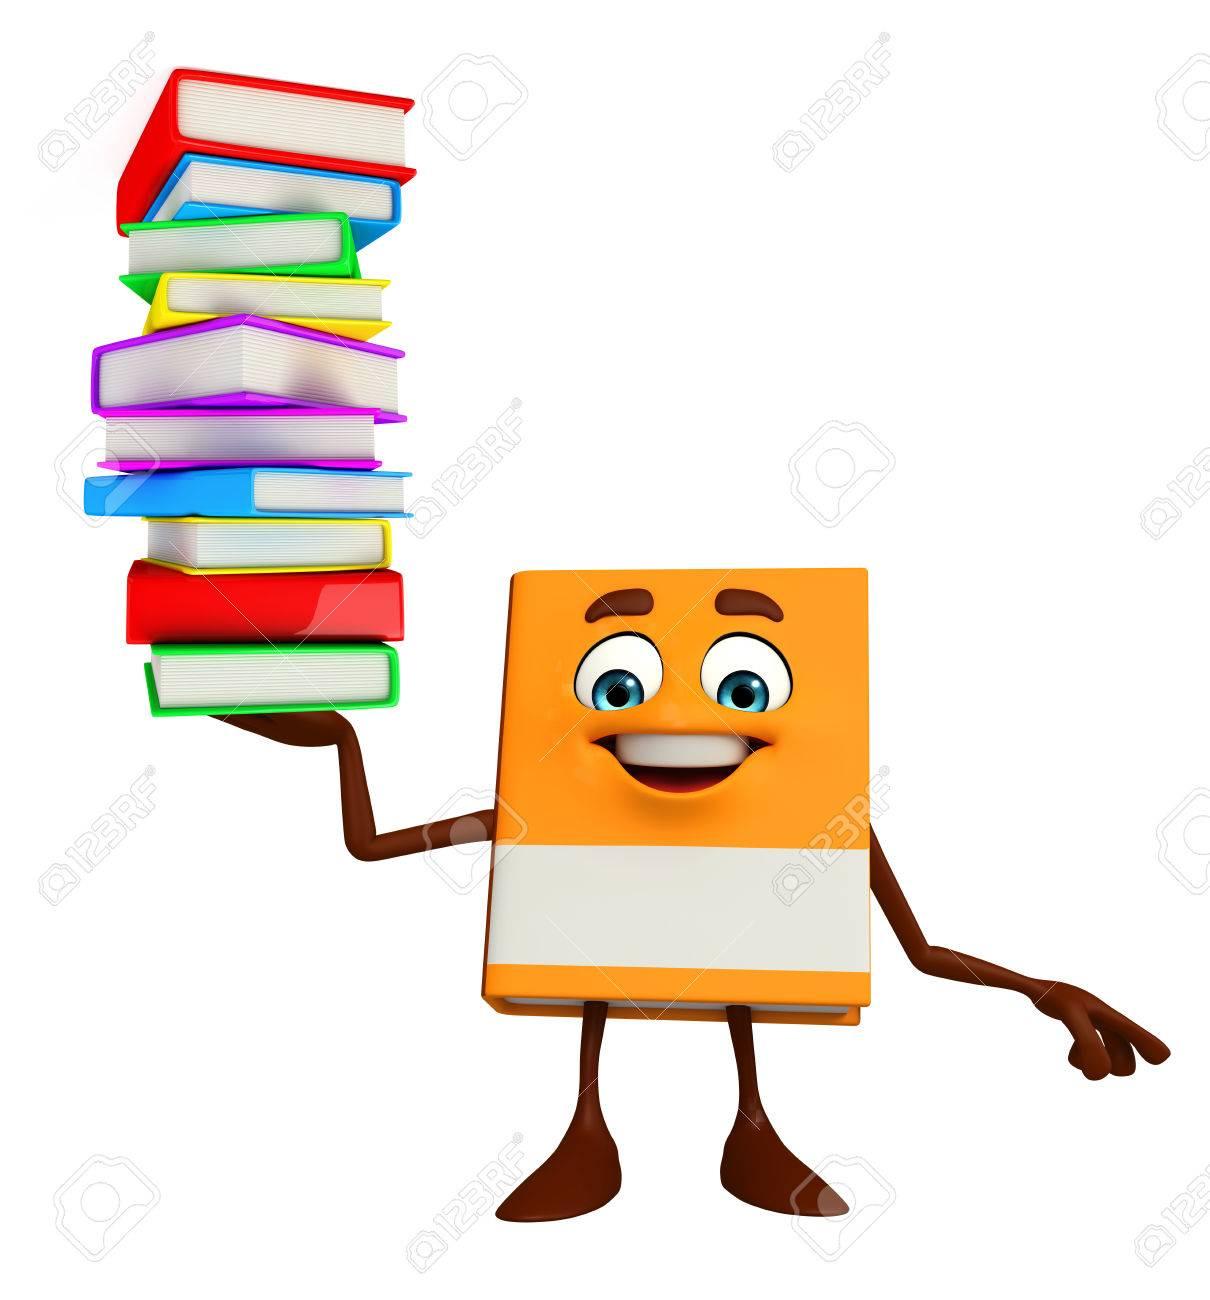 Books Cartoon Photos Cartoon Character of Books